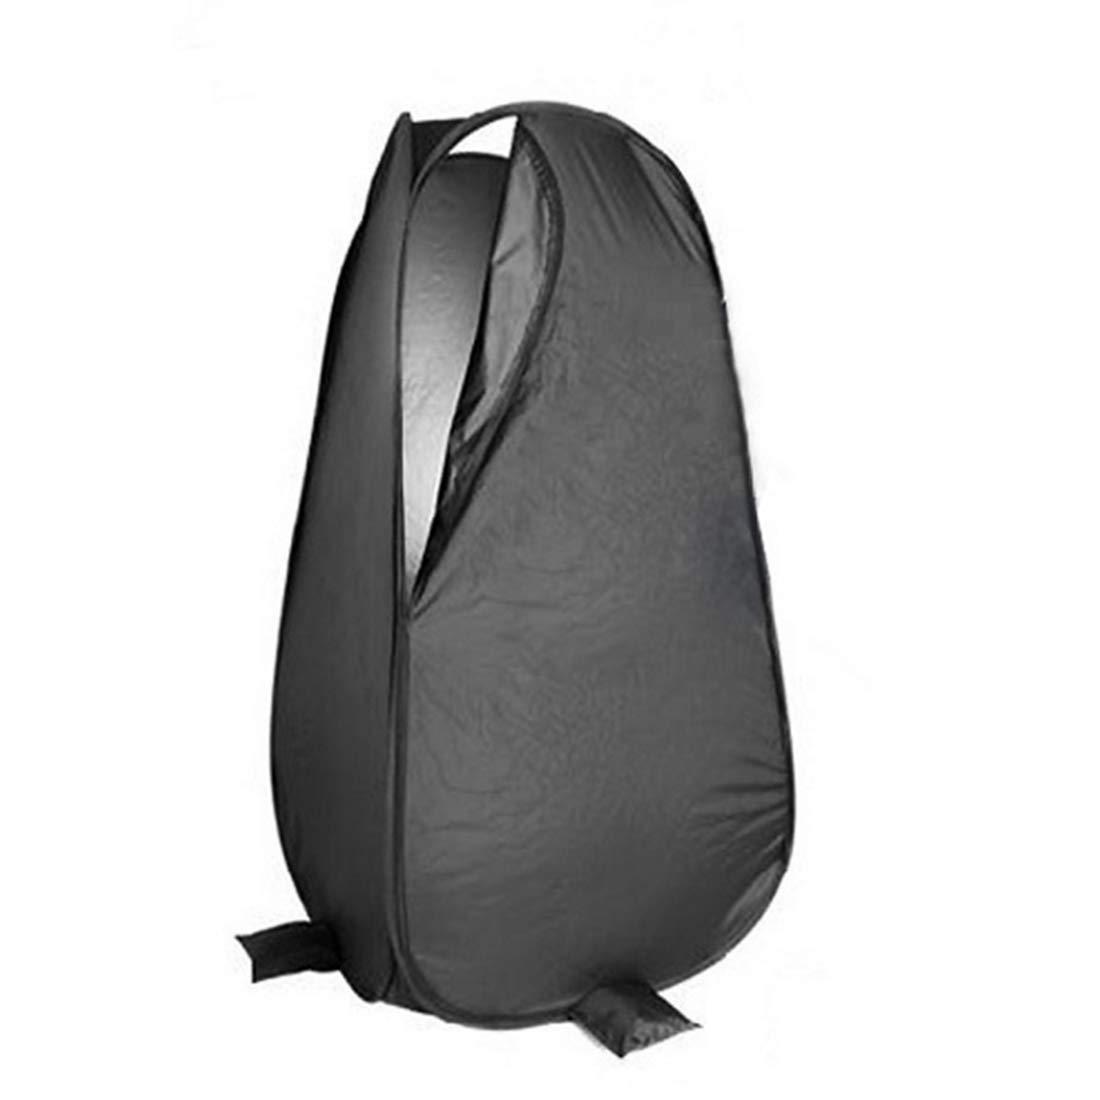 Nalkusxi Outdoor-Fotografie, tragbare Dressing Outdoor-Dressing, Shed, 190cm Outdoor-Dressing, Dressing Mobile Schuppen, faltendes Zelt 4d0ba5